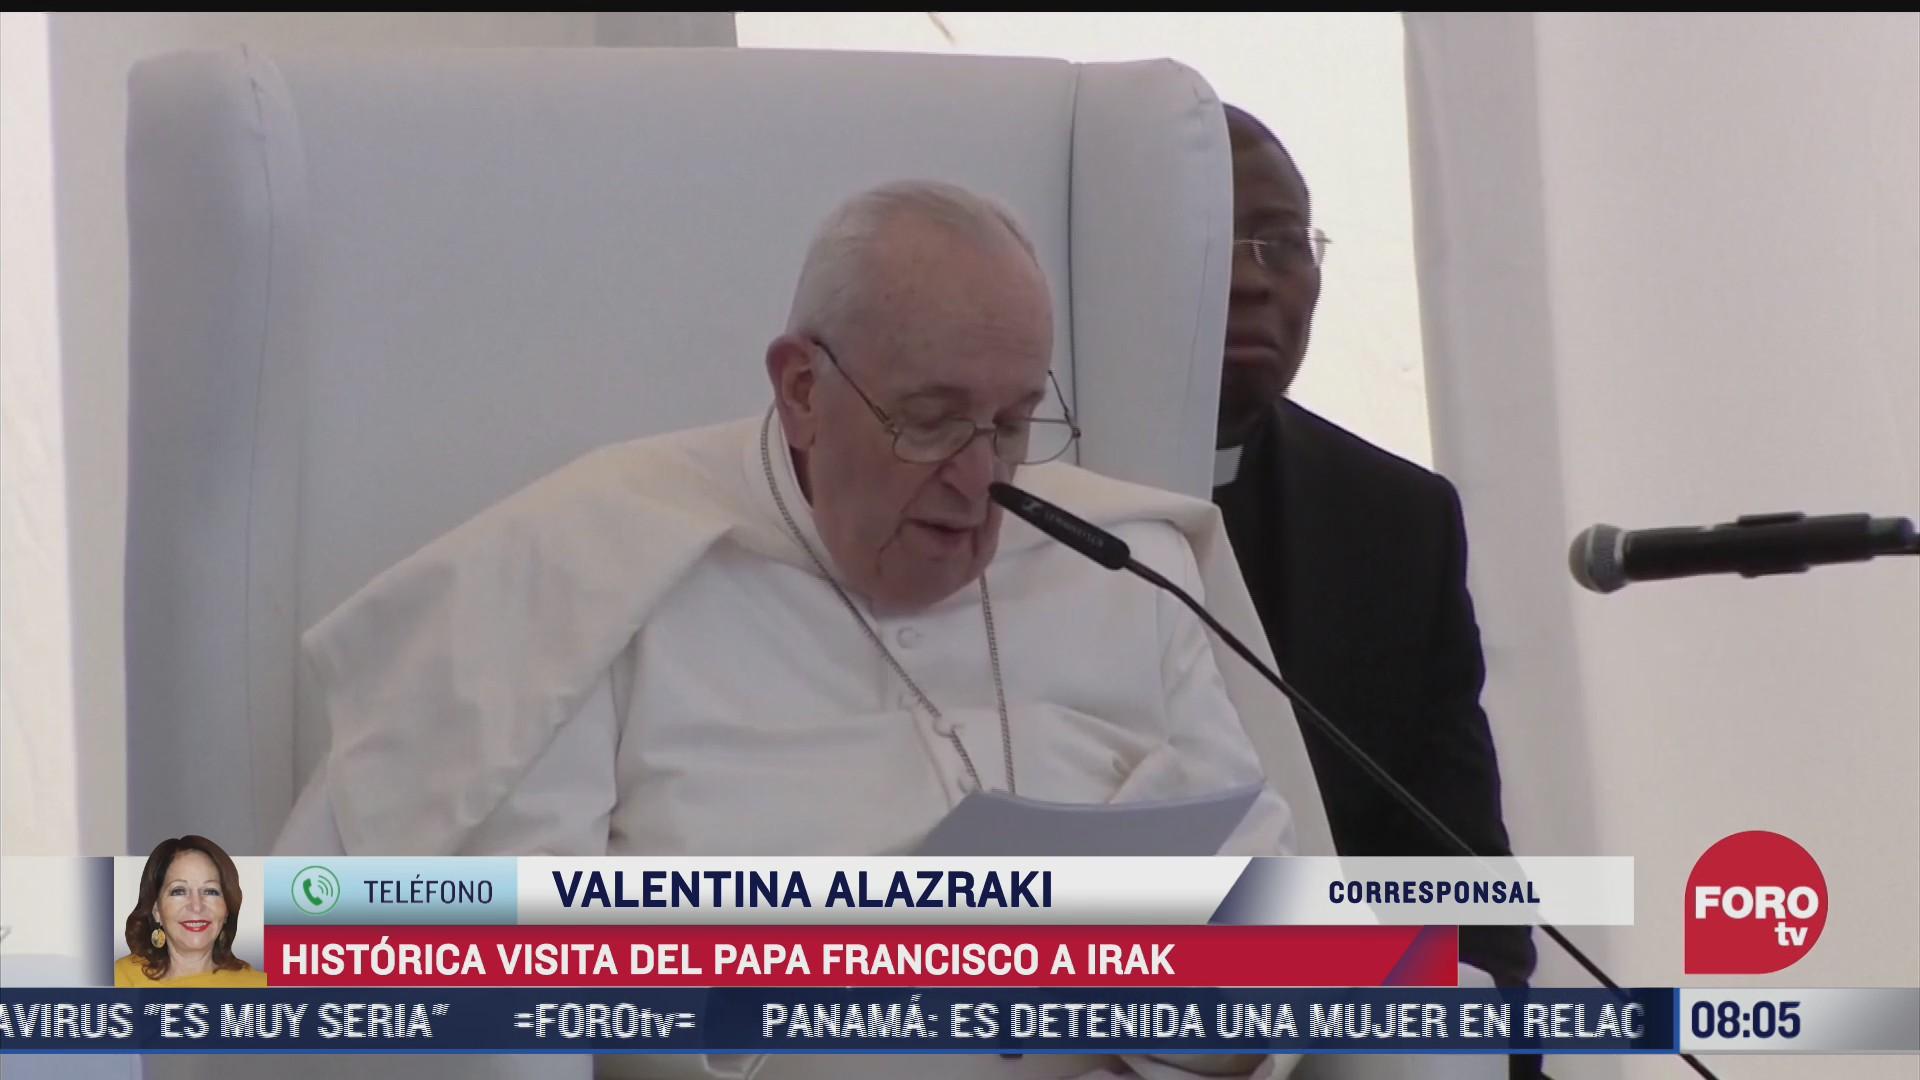 historica visita del papa francisco a irak